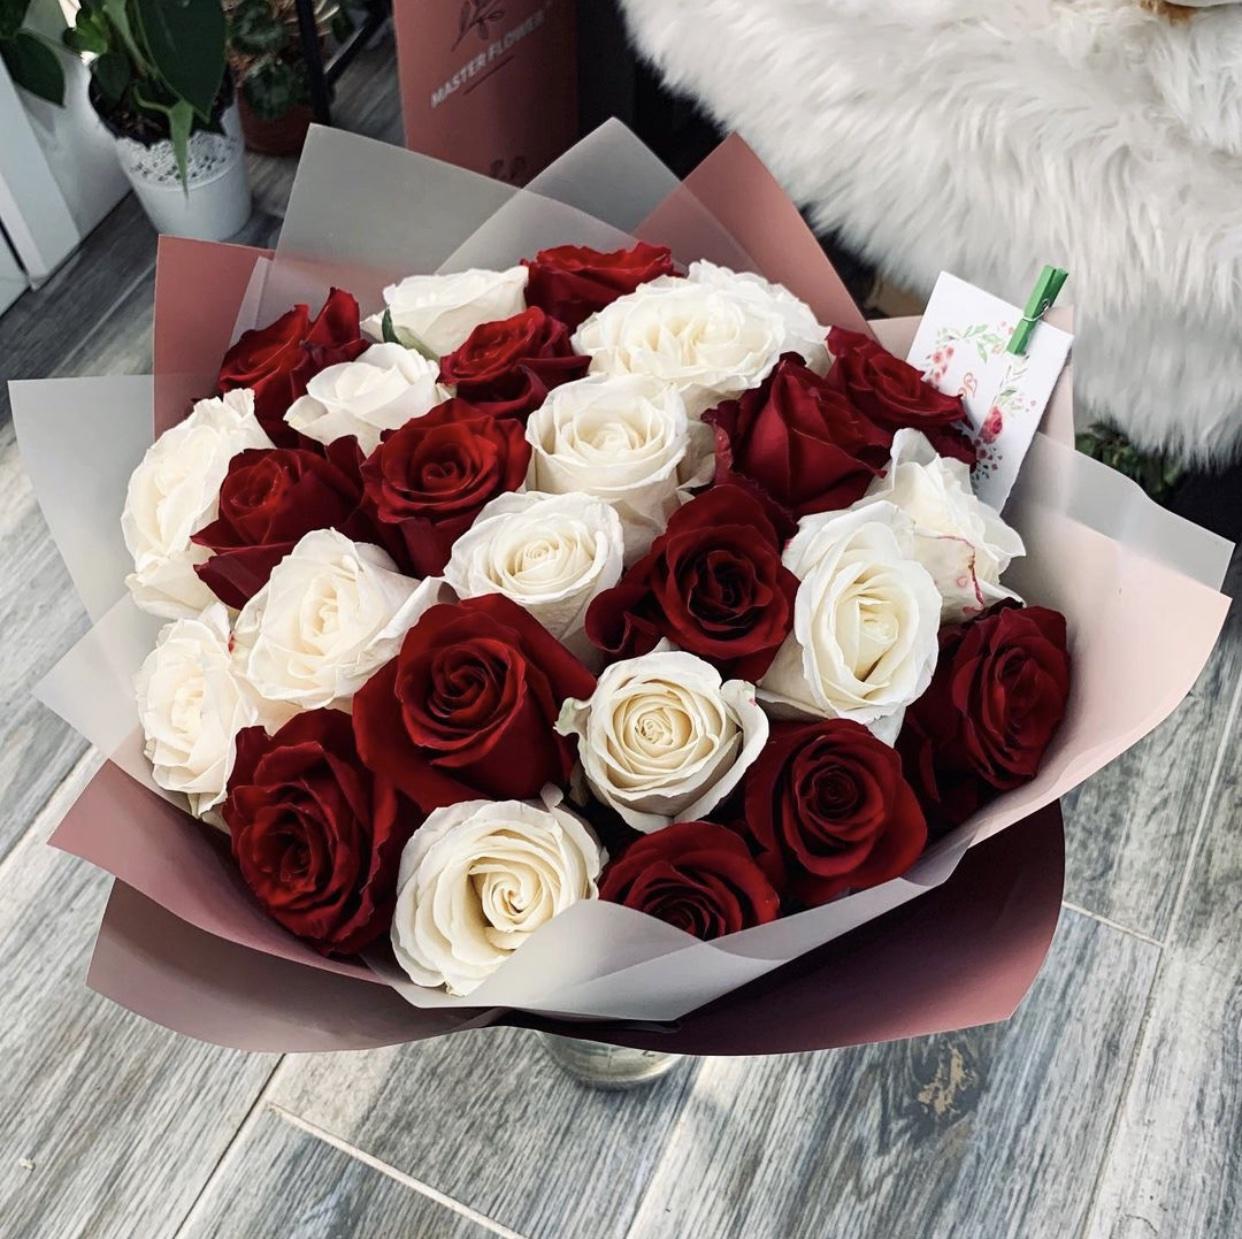 Buchet 25 de trandafiri rosii si albi